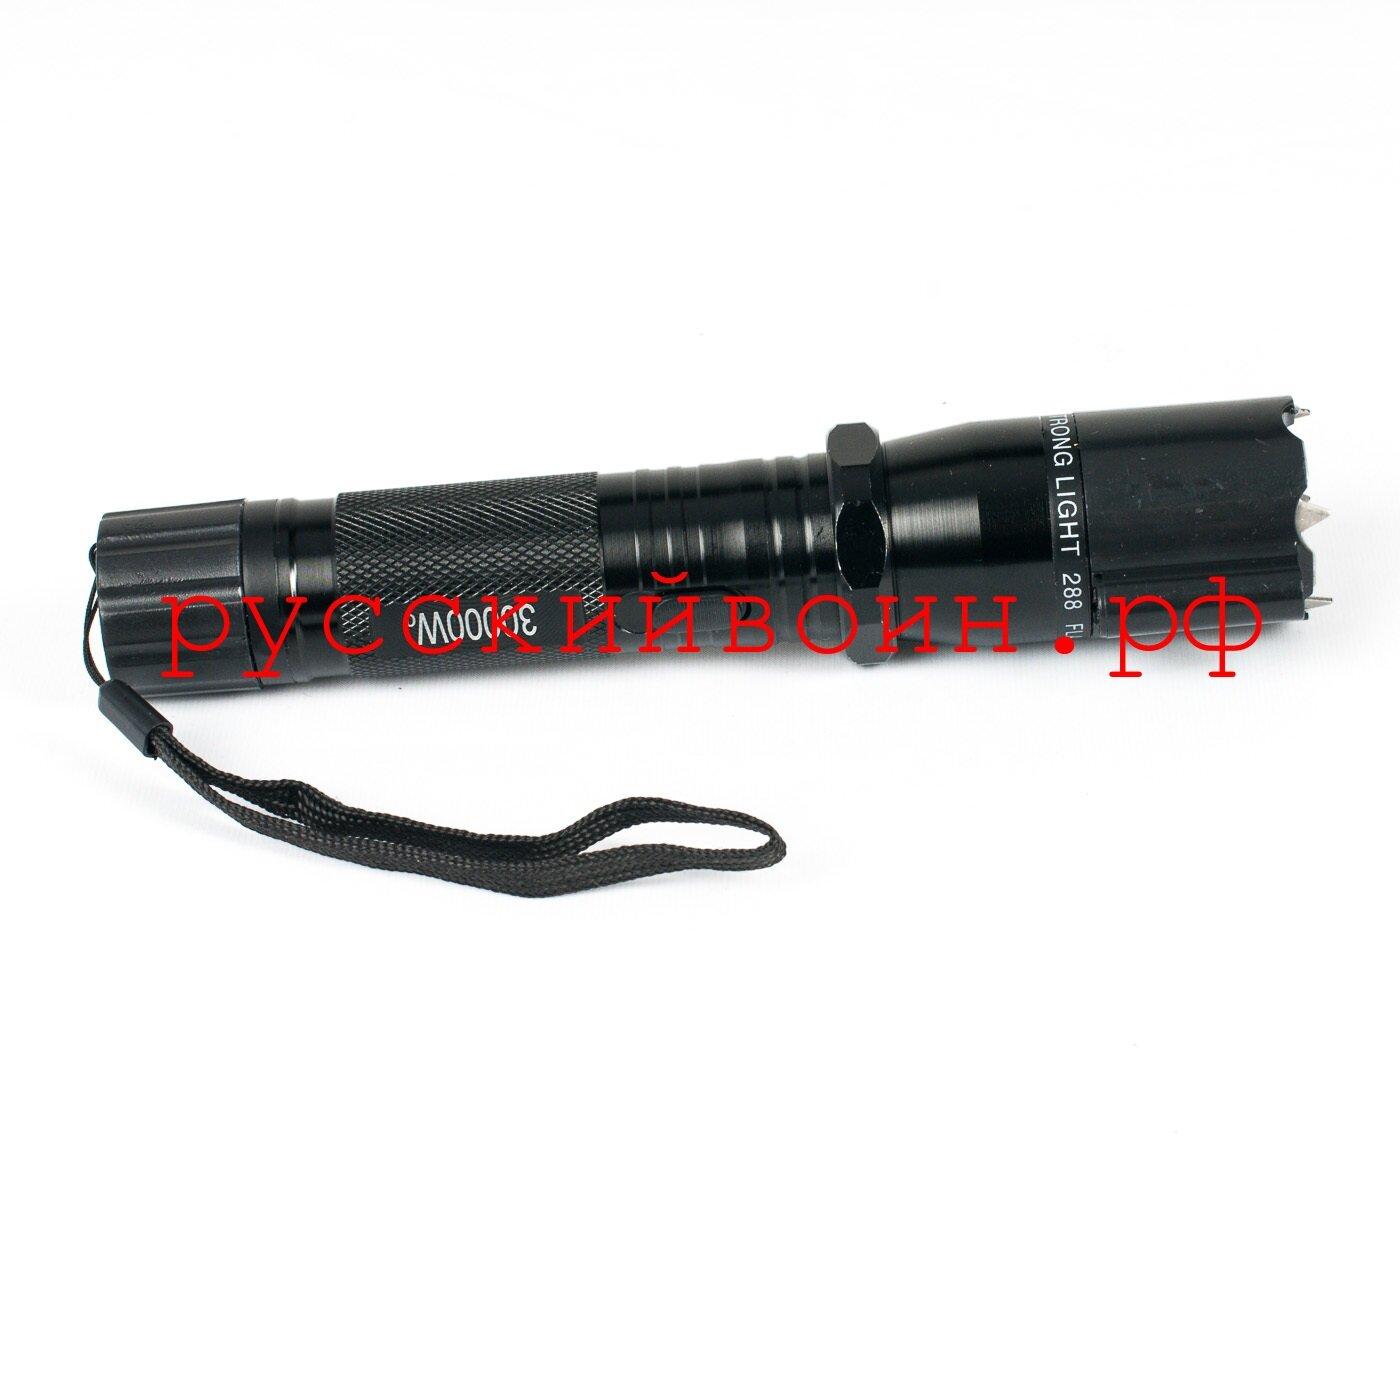 Электрошокер Police 288, тактический лазер - фото Электрошокер Police 288